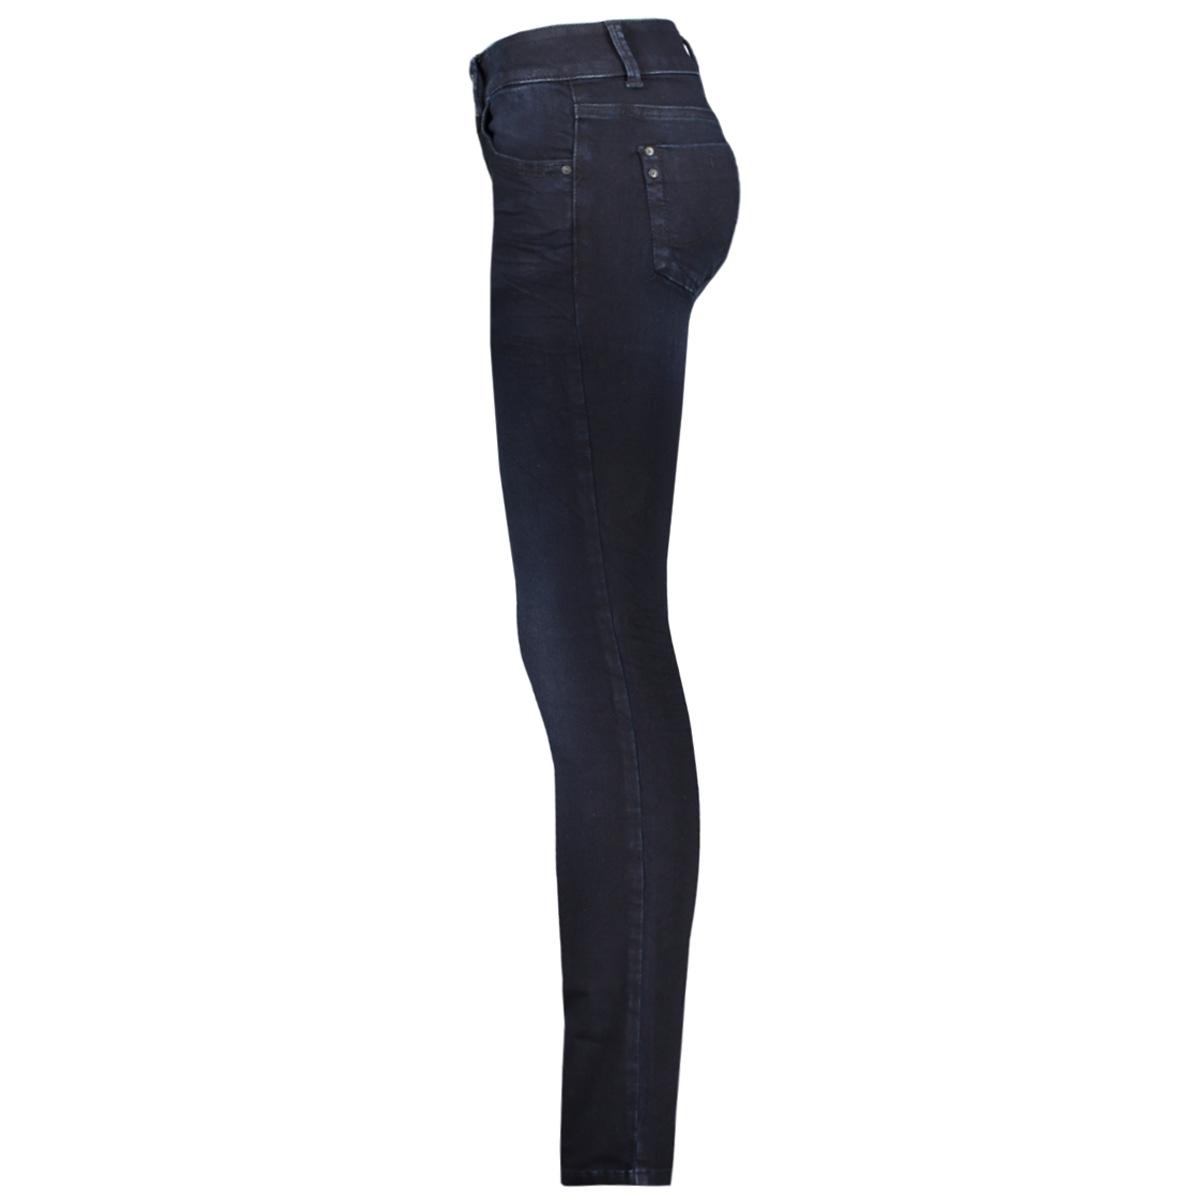 10095061813645 ltb jeans parvin wash 51272